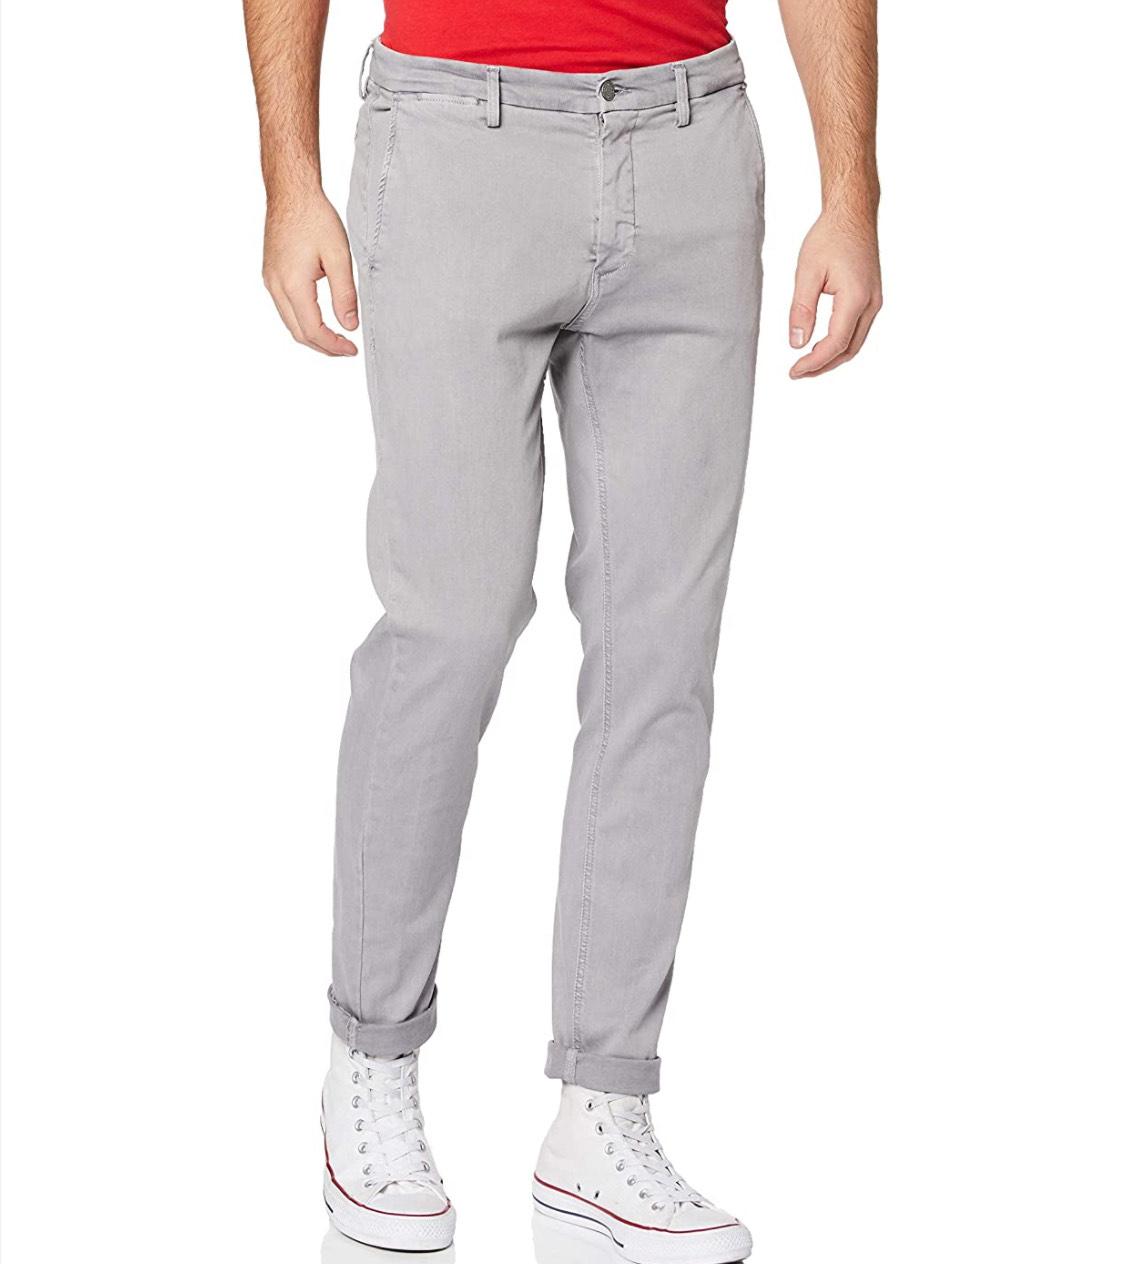 Pantalón REPLAY hombre talla 29W/30L (38 corto) 29W/34L azul claro a 20,64€.